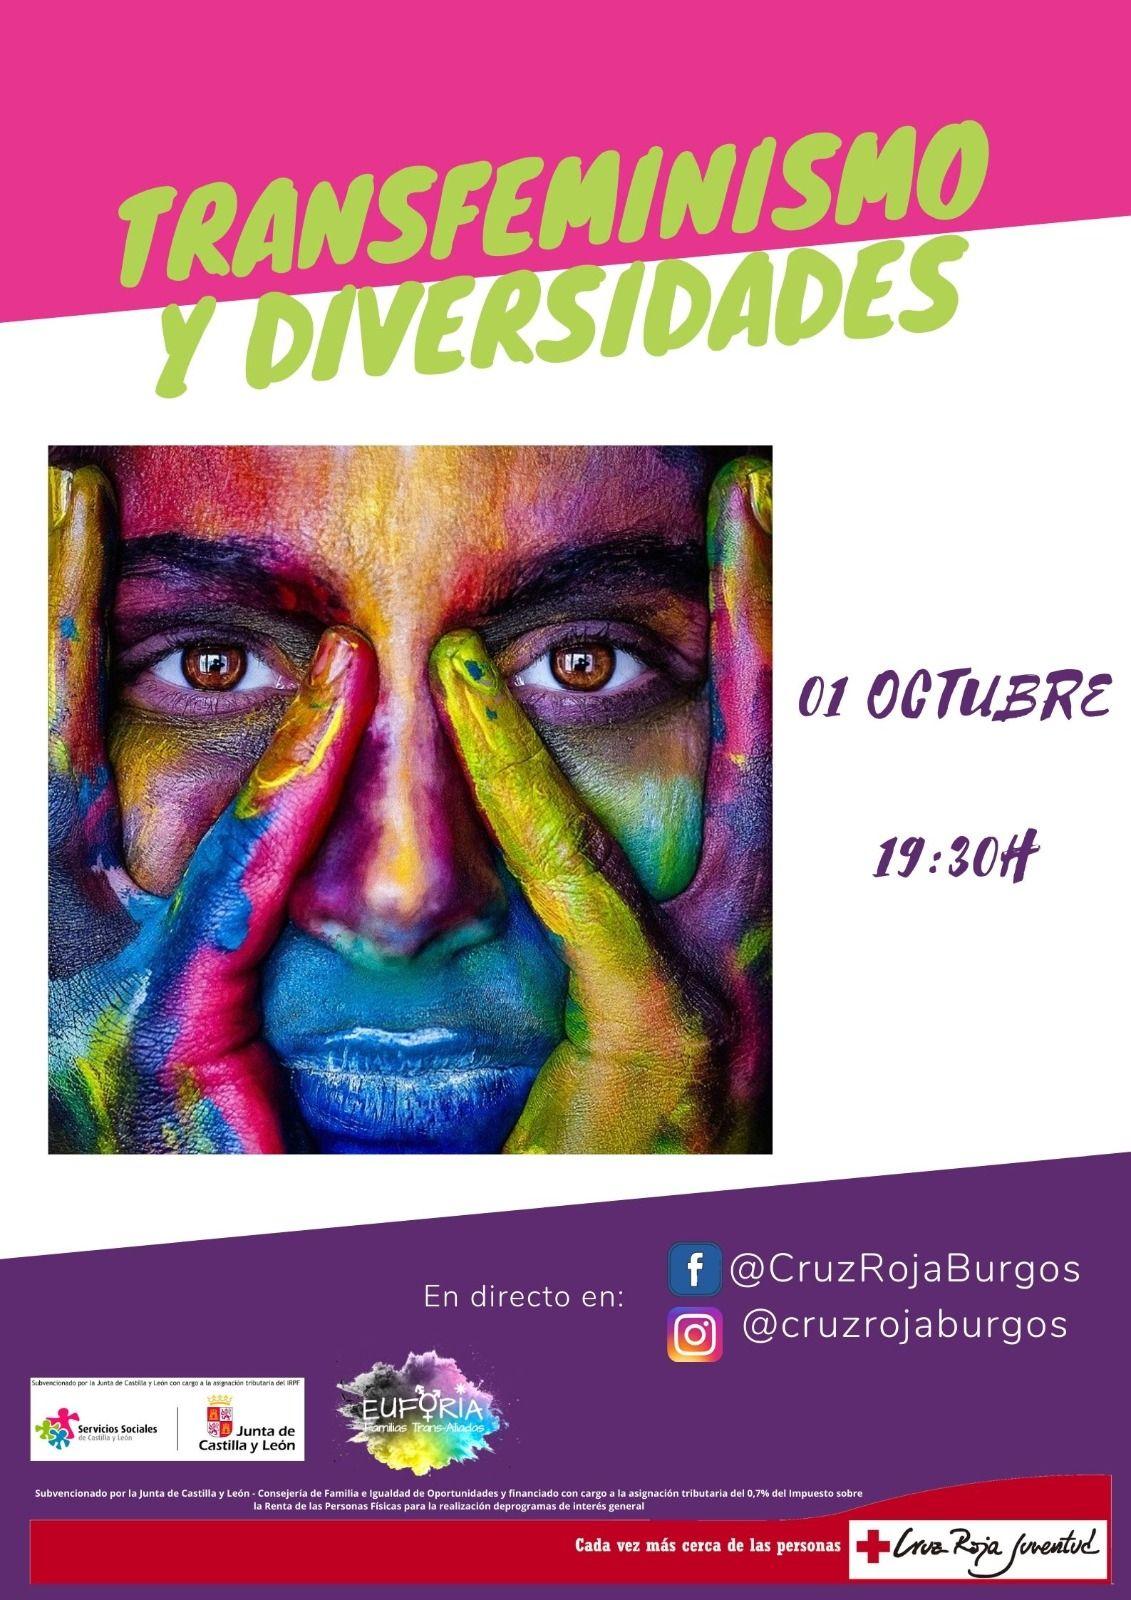 Transfeminismo y Diversidades - Facebook e Instagram